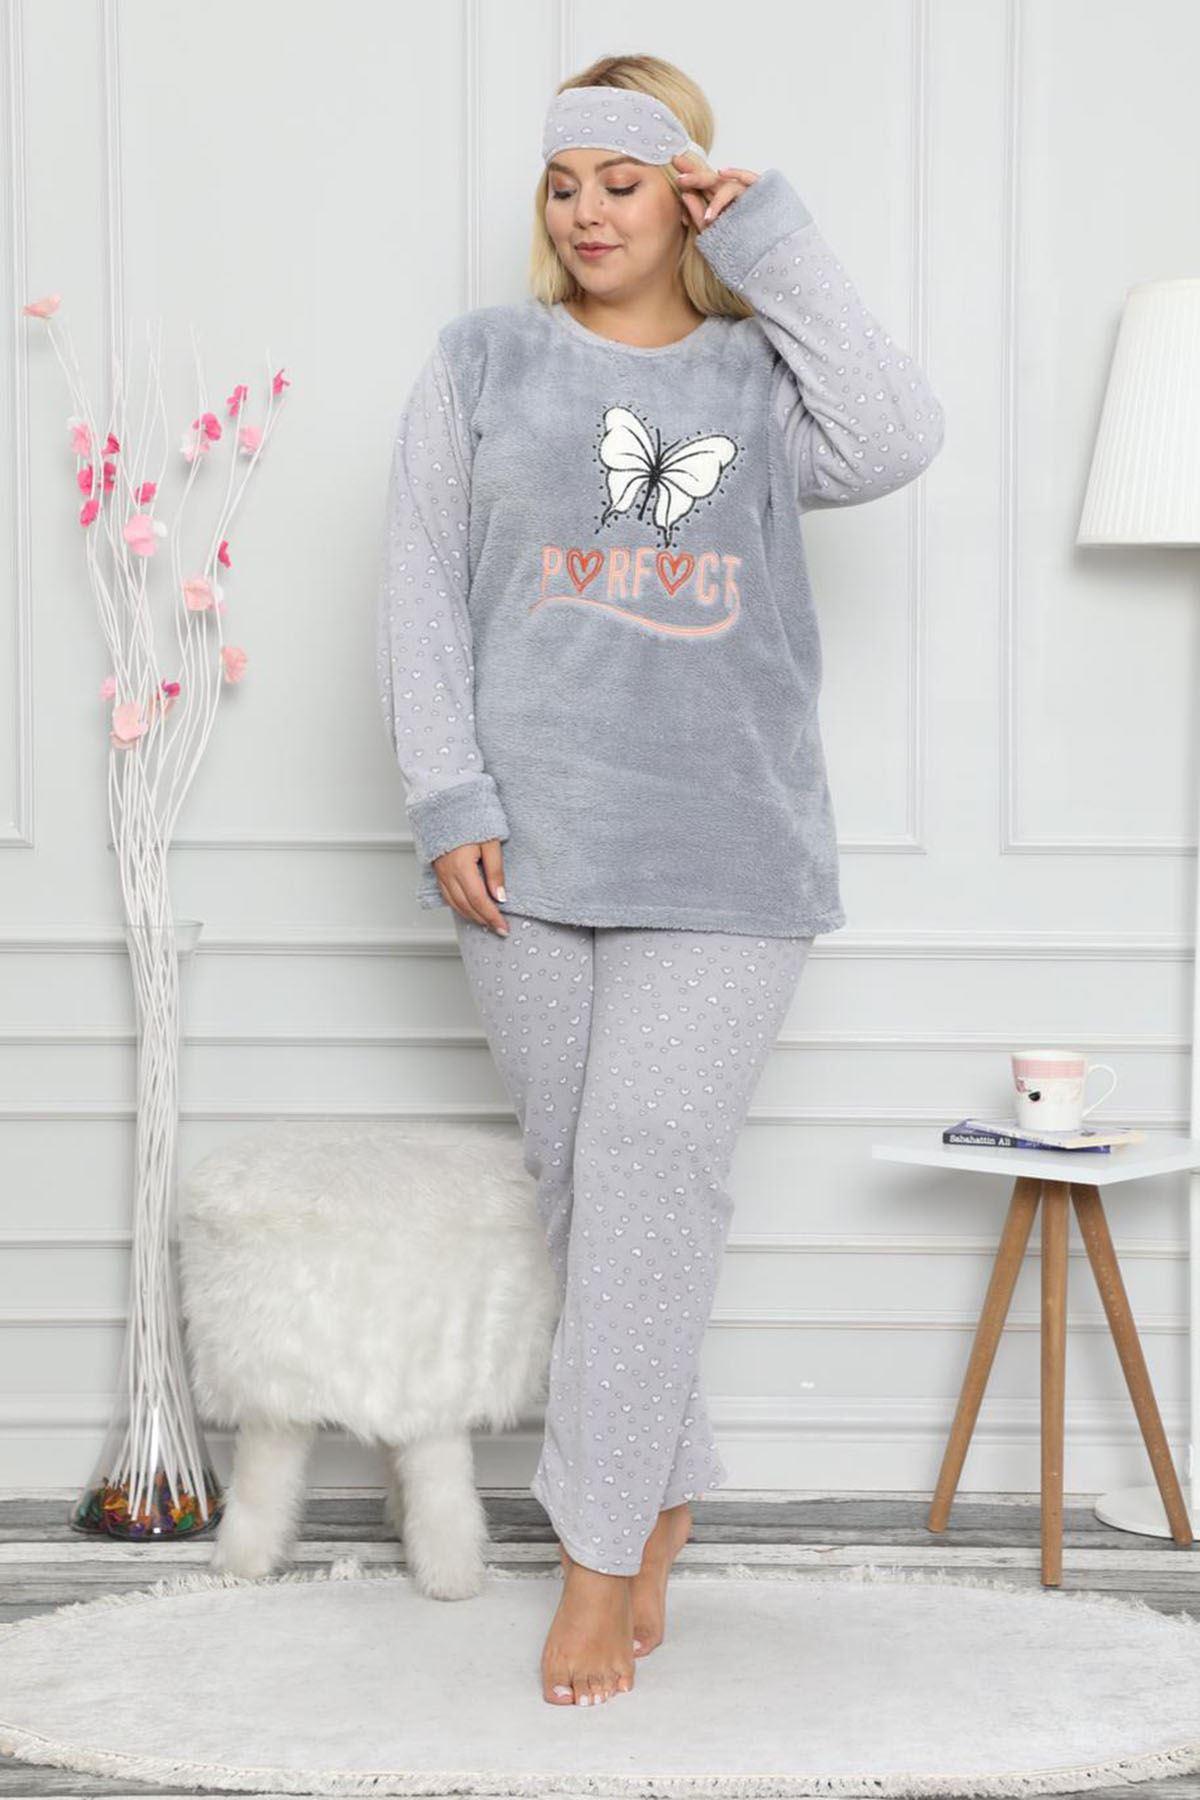 Welsoft Kelebekli Gri Pijama Takımı 32C-59056G